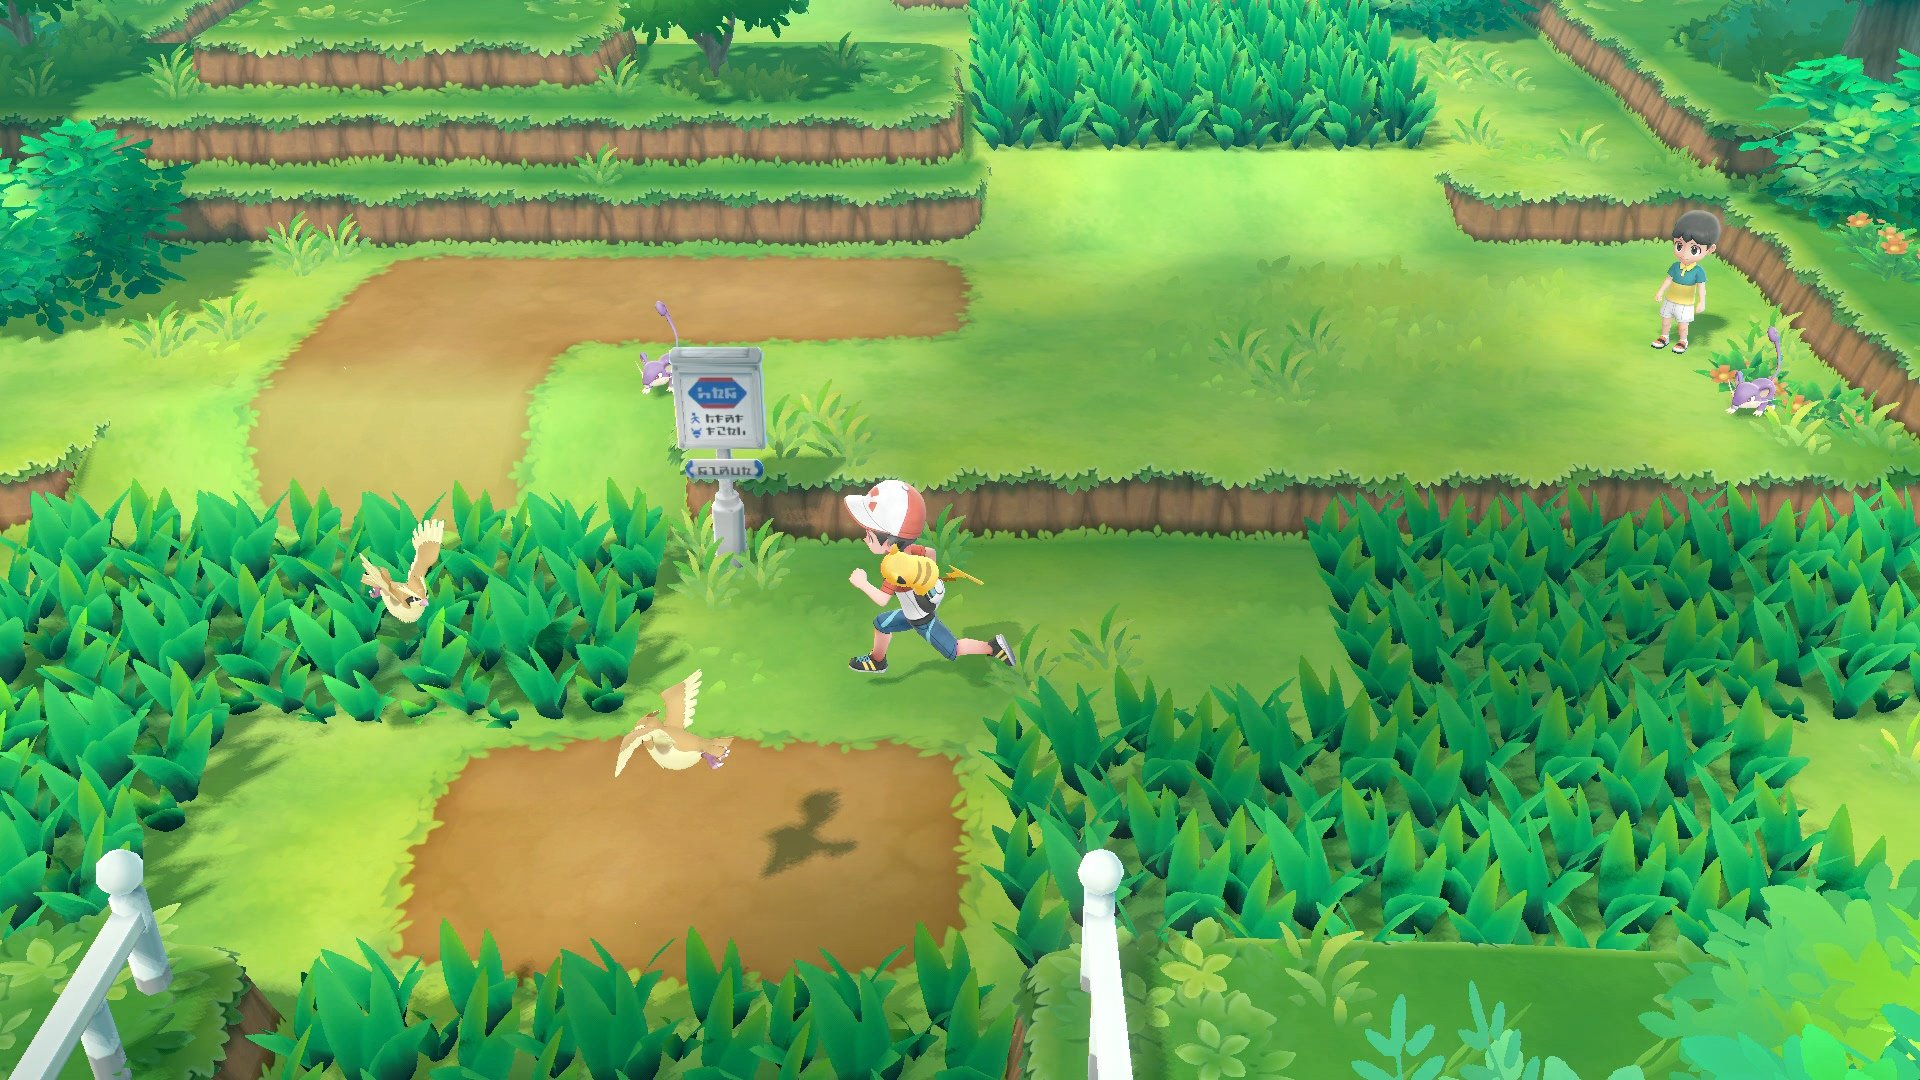 pok_mon_rpg__2nintendo-switch_frikigamers.com